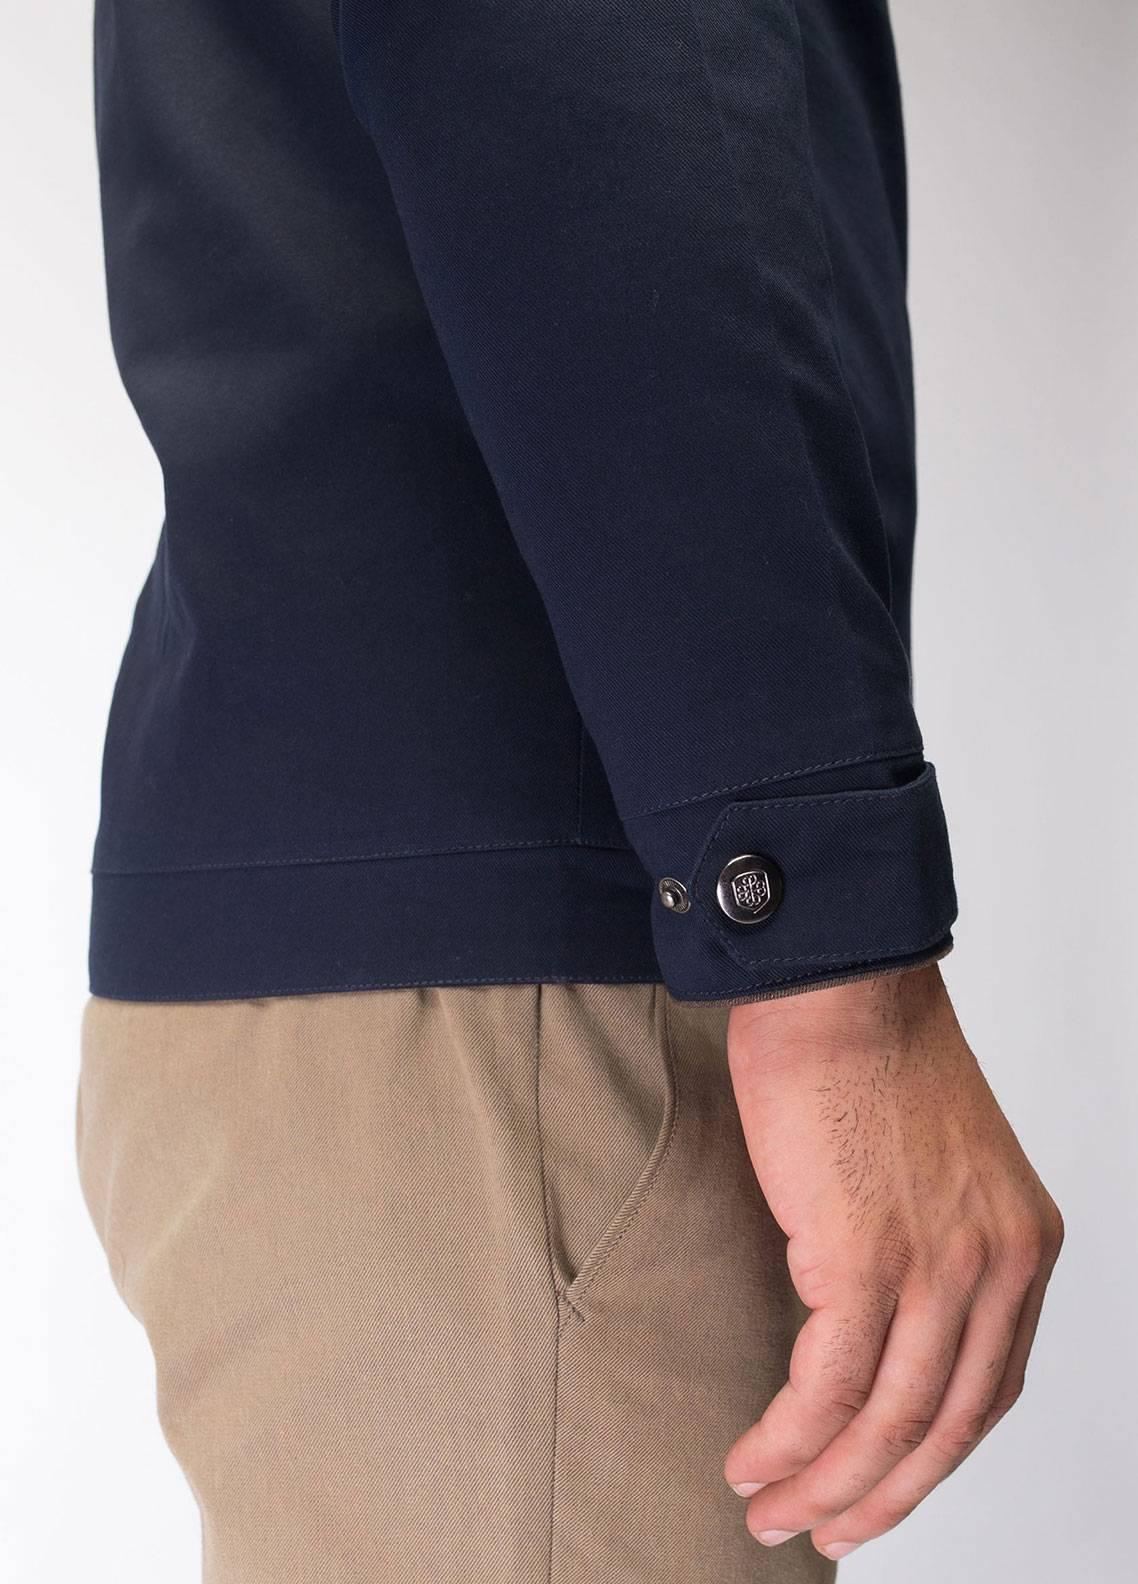 Brumano Cotton Full Sleeves Jackets for Men - Navy Blue BRM-11-0016